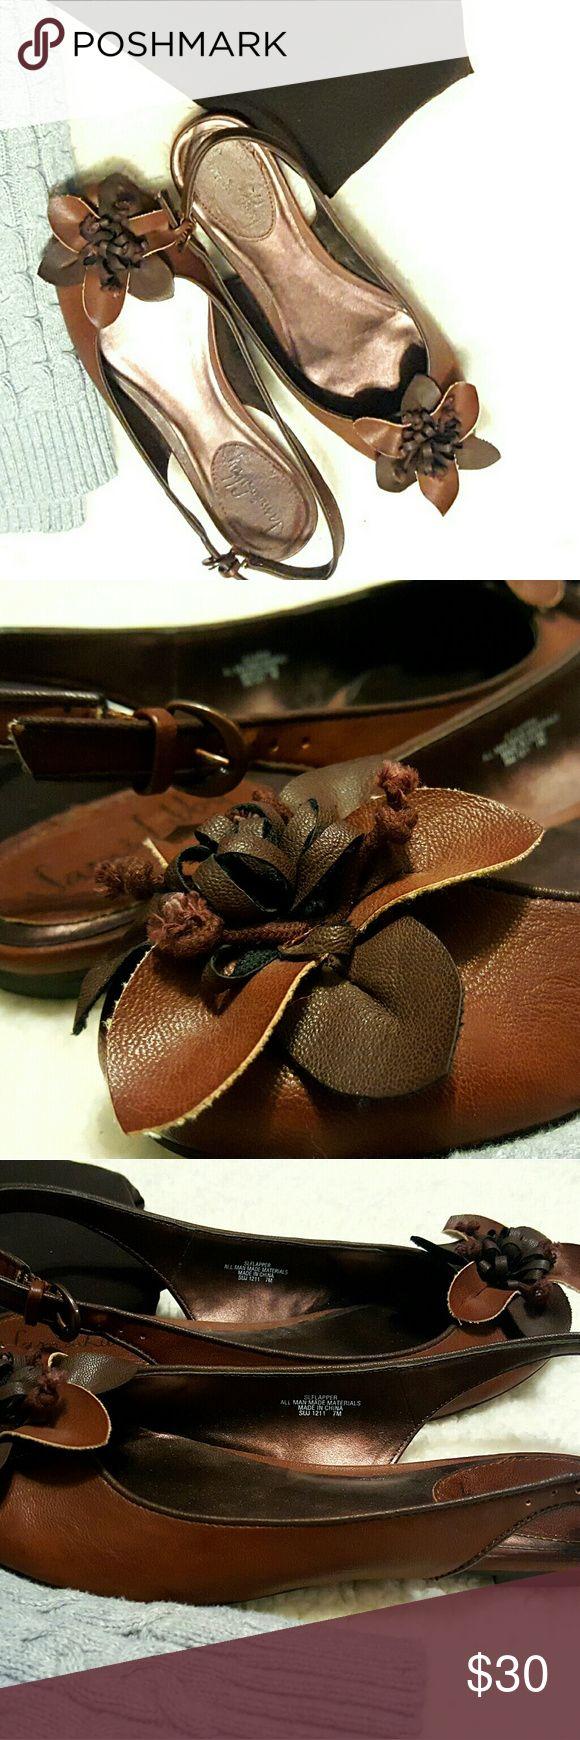 NWOT Brown slingbacks flats Sam & Libby size 7 NWOT slingback flats by Sam & Libby, size 7. Sam & Libby Shoes Flats & Loafers